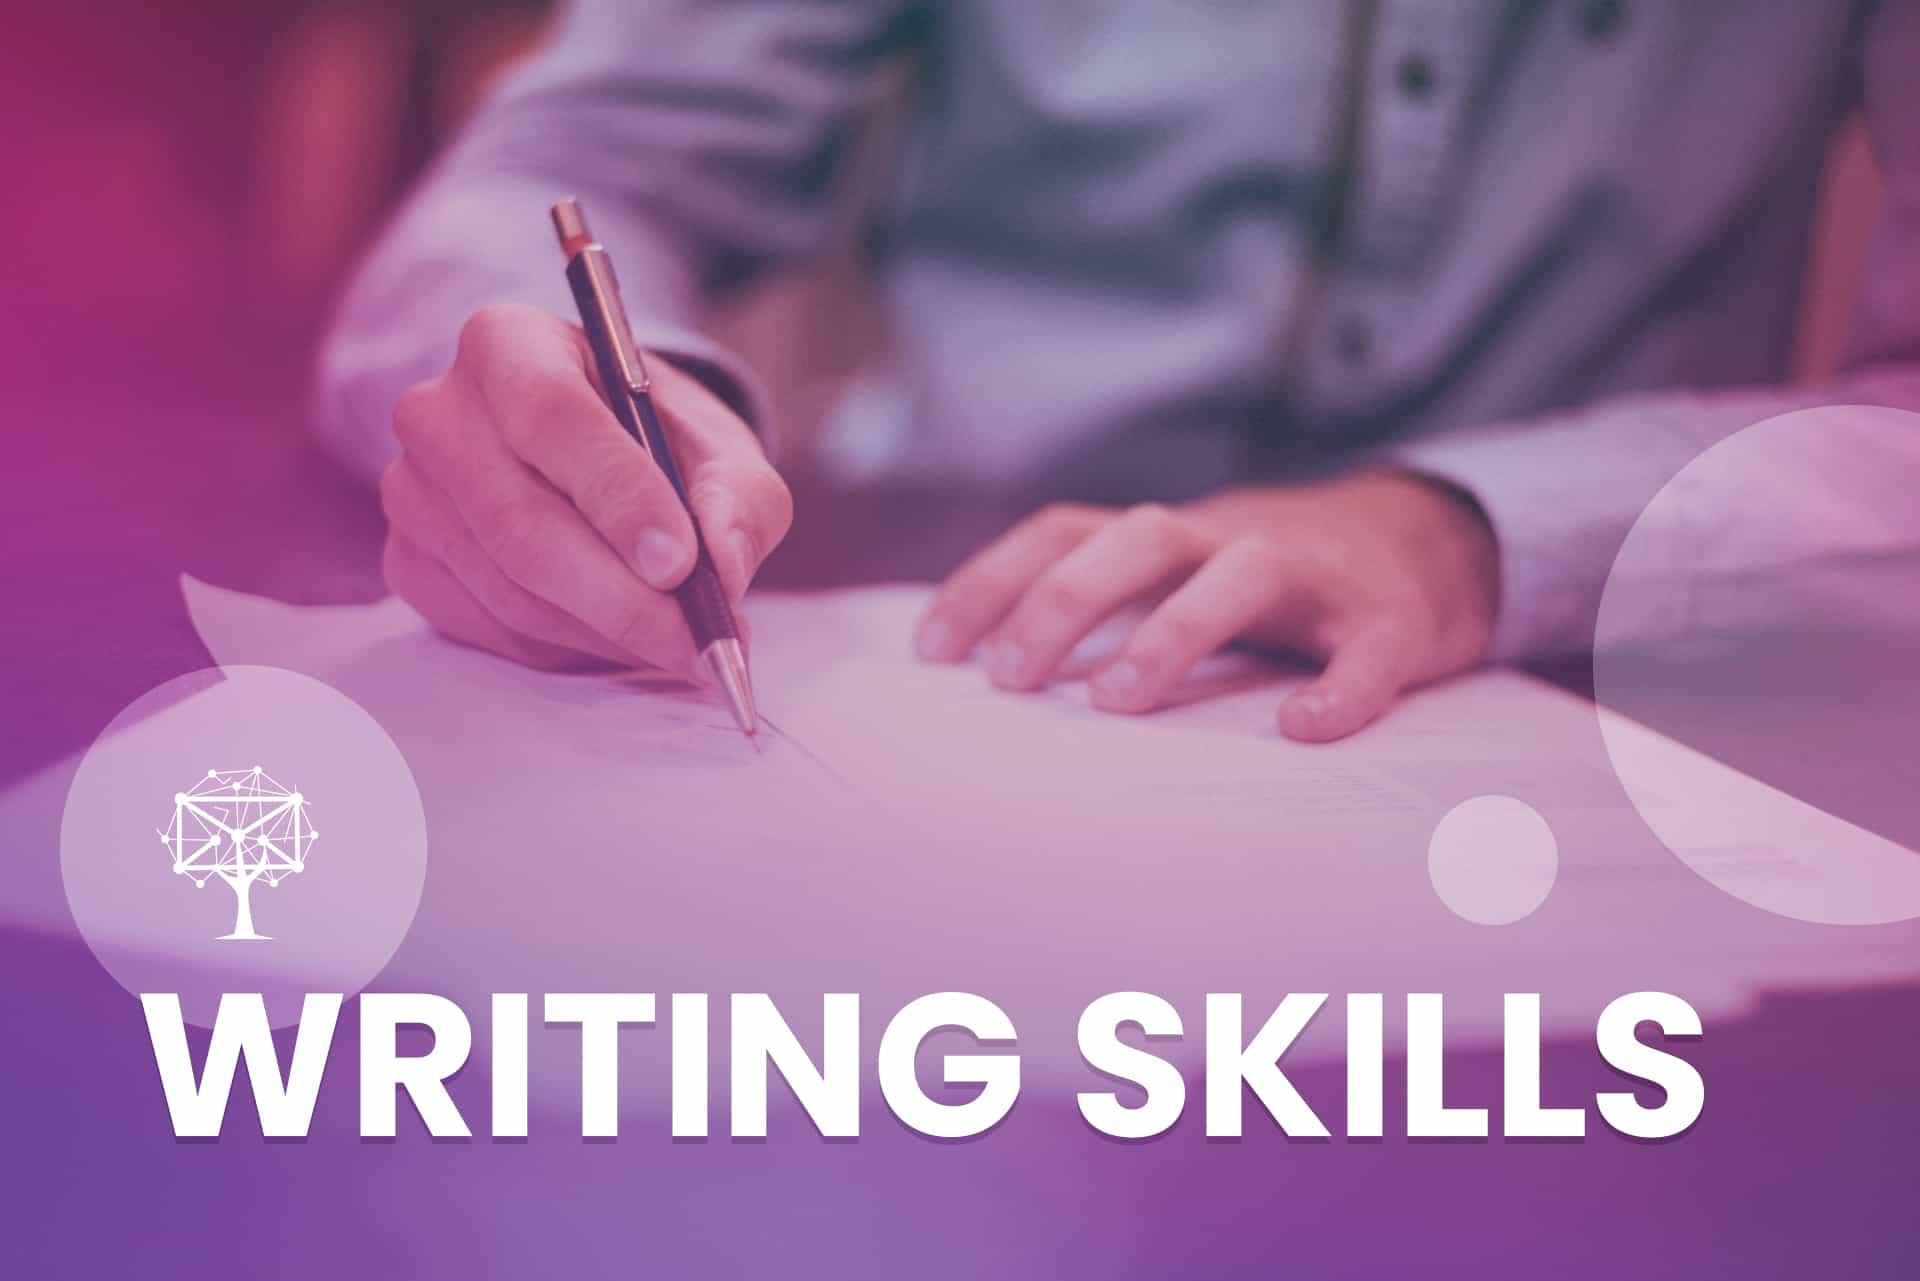 Writing Skills is a customer service skill